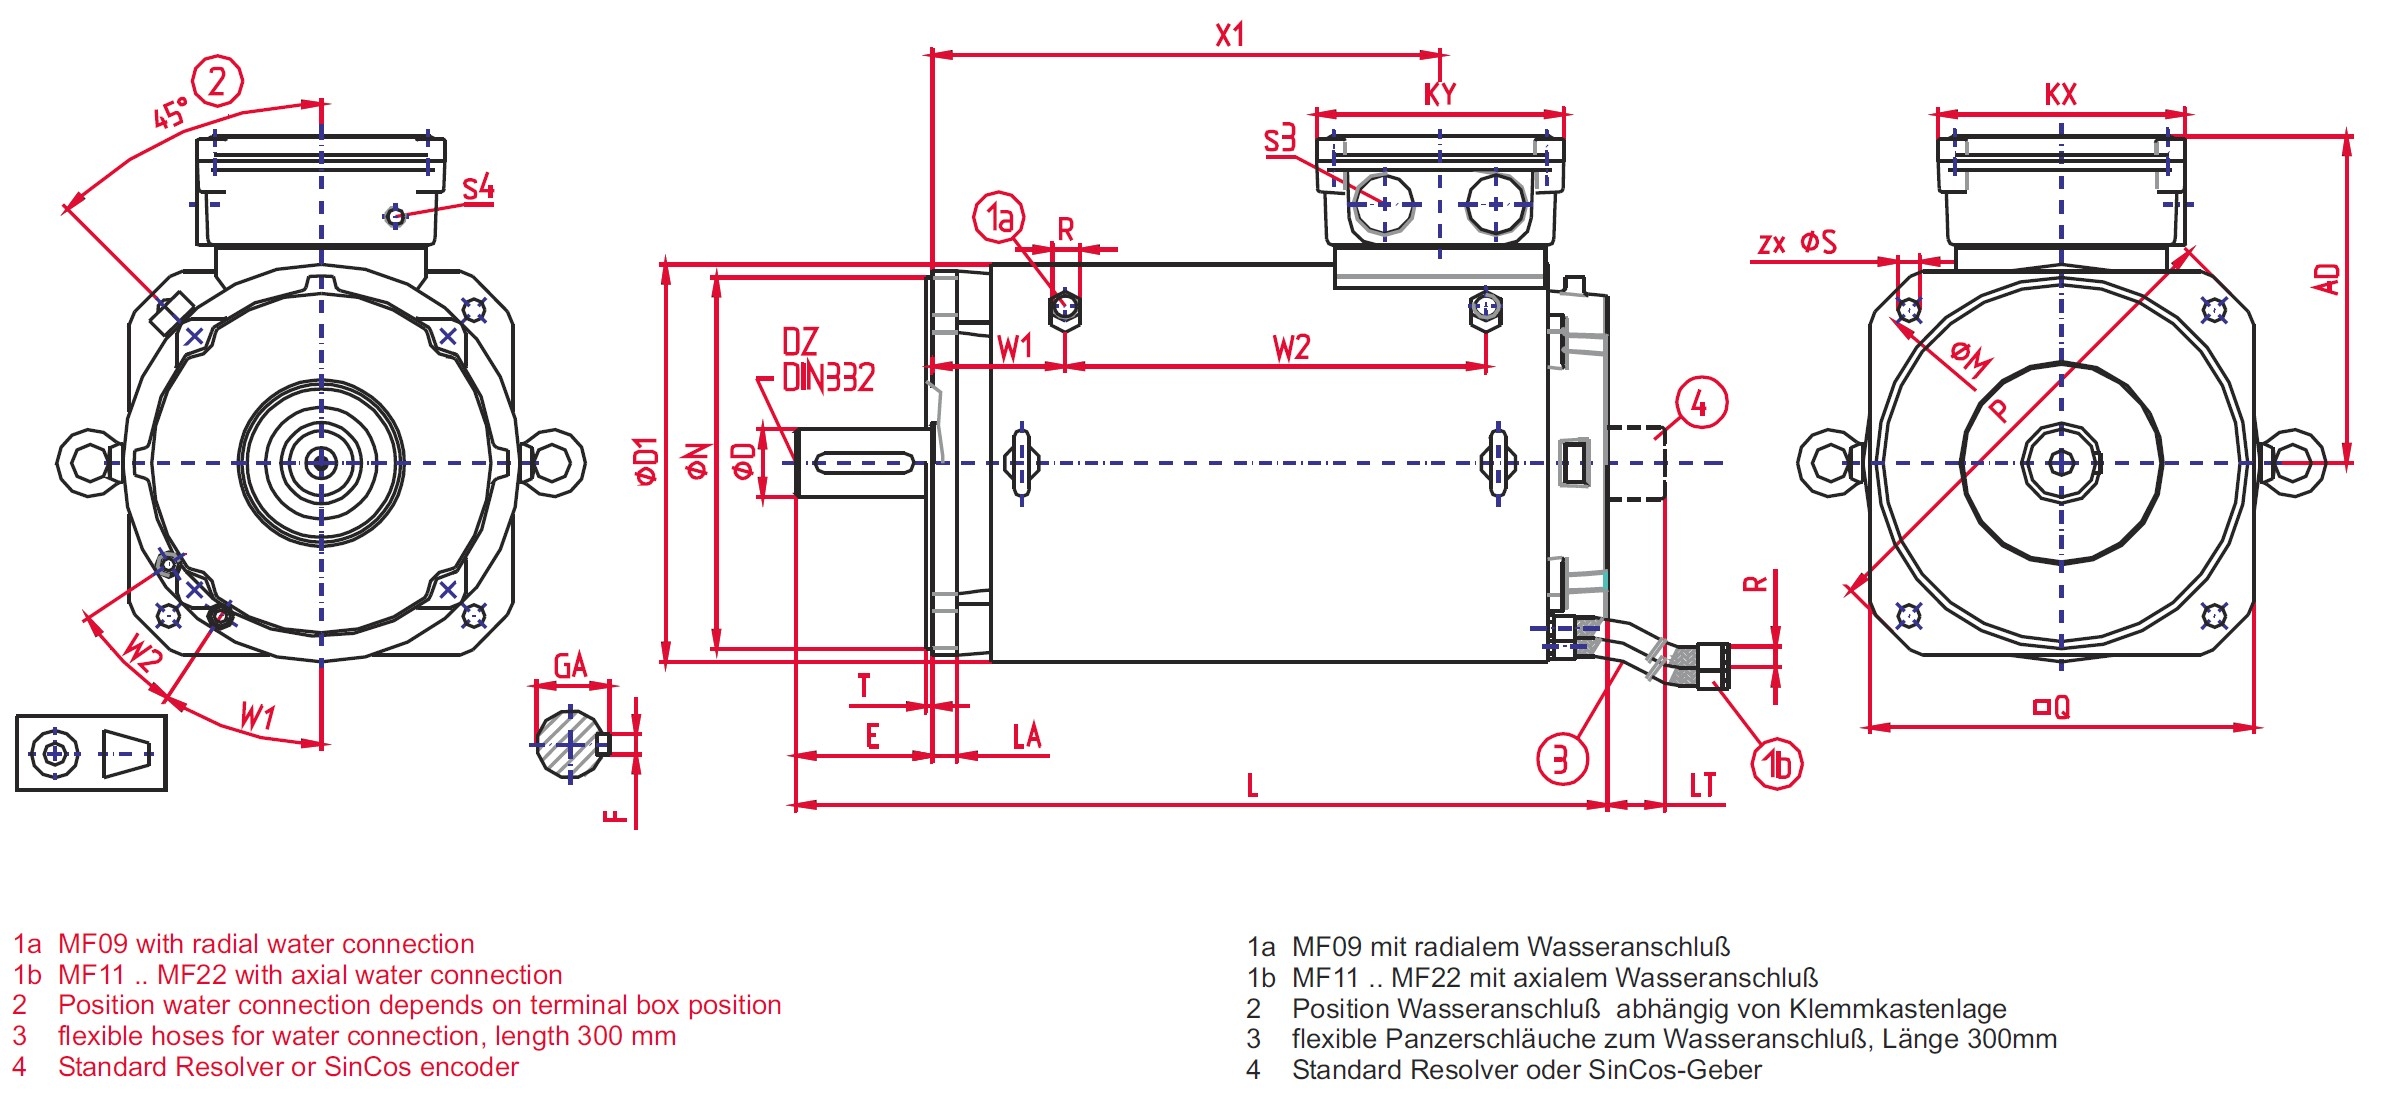 3 Phase Motor Wiring Diagram Oswald Mf Synchronous Motors Wiring Diagram Ponents Of 3 Phase Motor Wiring Diagram